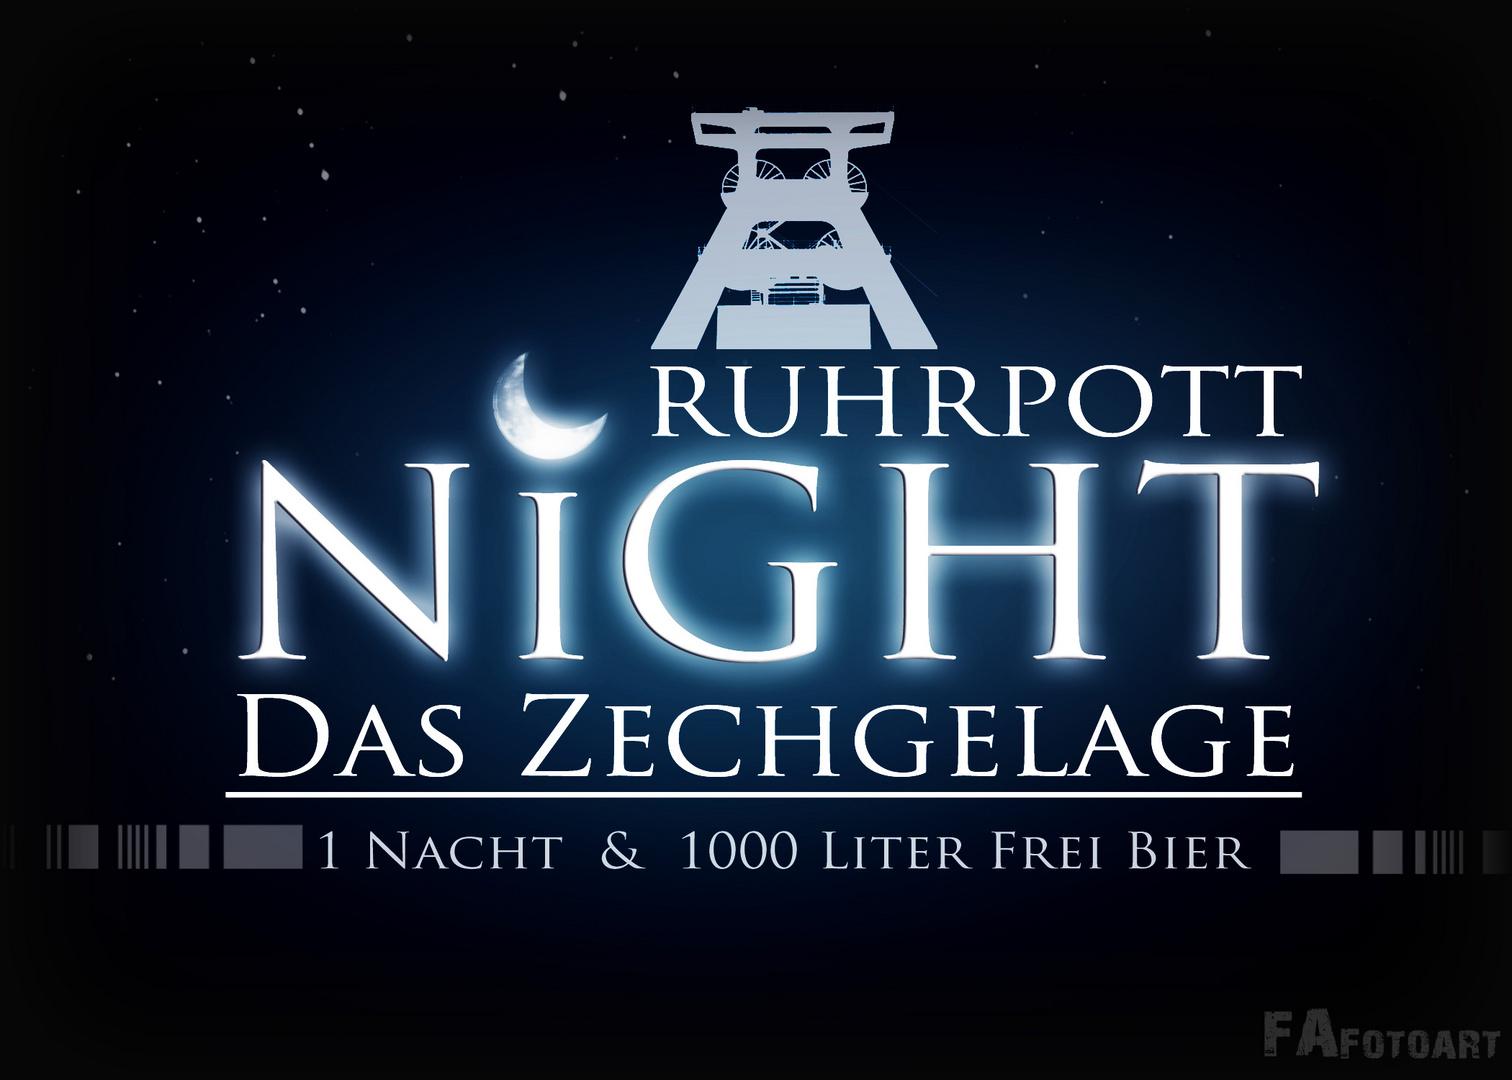 Ruhrpott Night